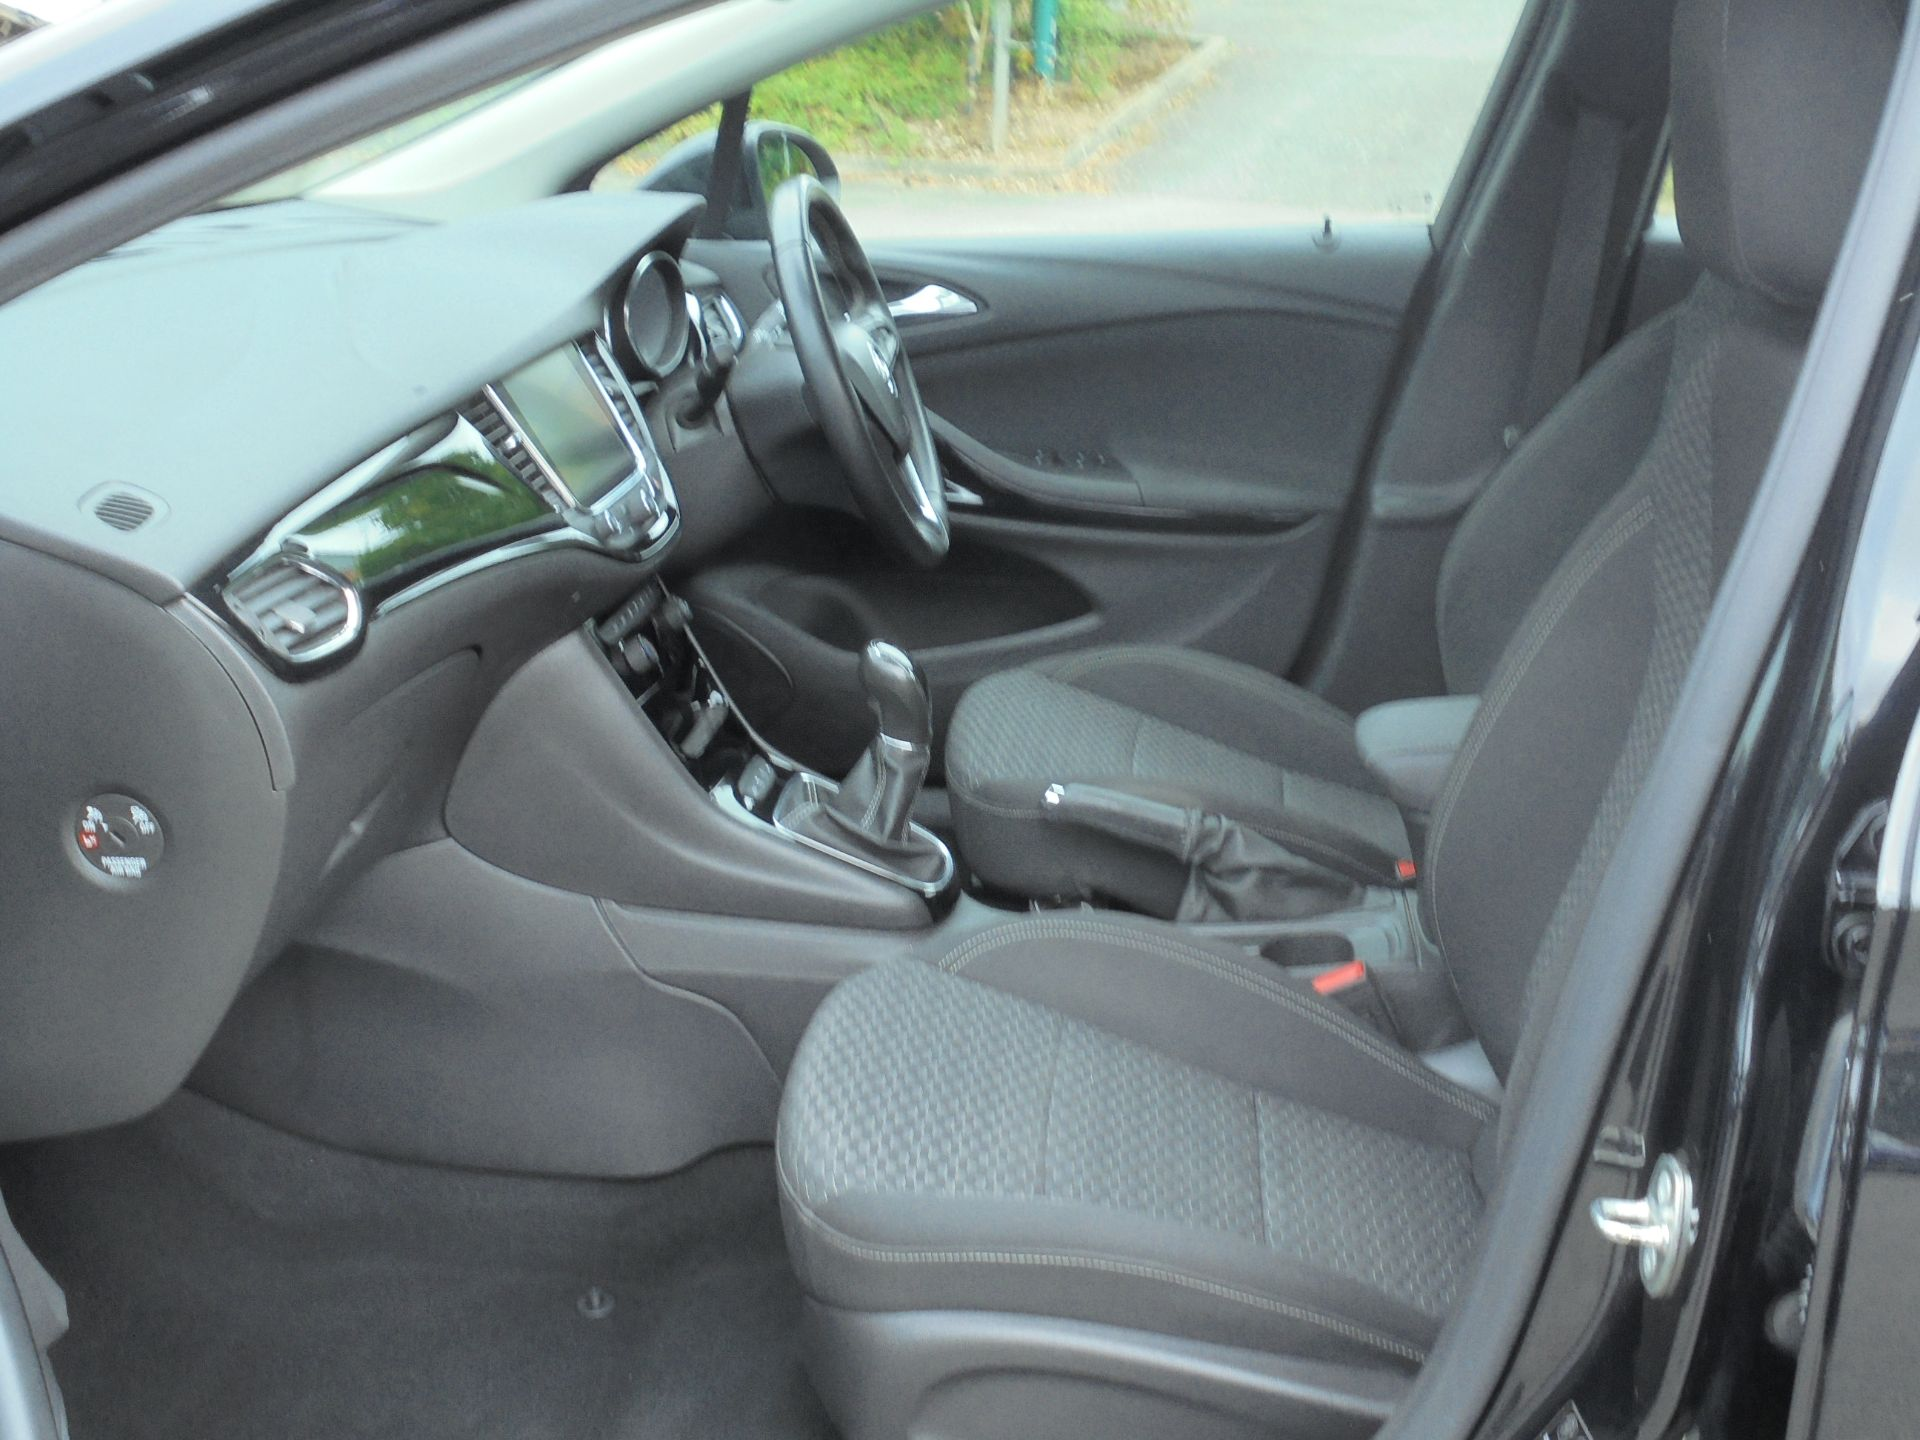 2018 Vauxhall Astra Sports Tourer 1.6 Cdti 16V 136 Sri Nav 5Dr (VU18DFJ) Image 5